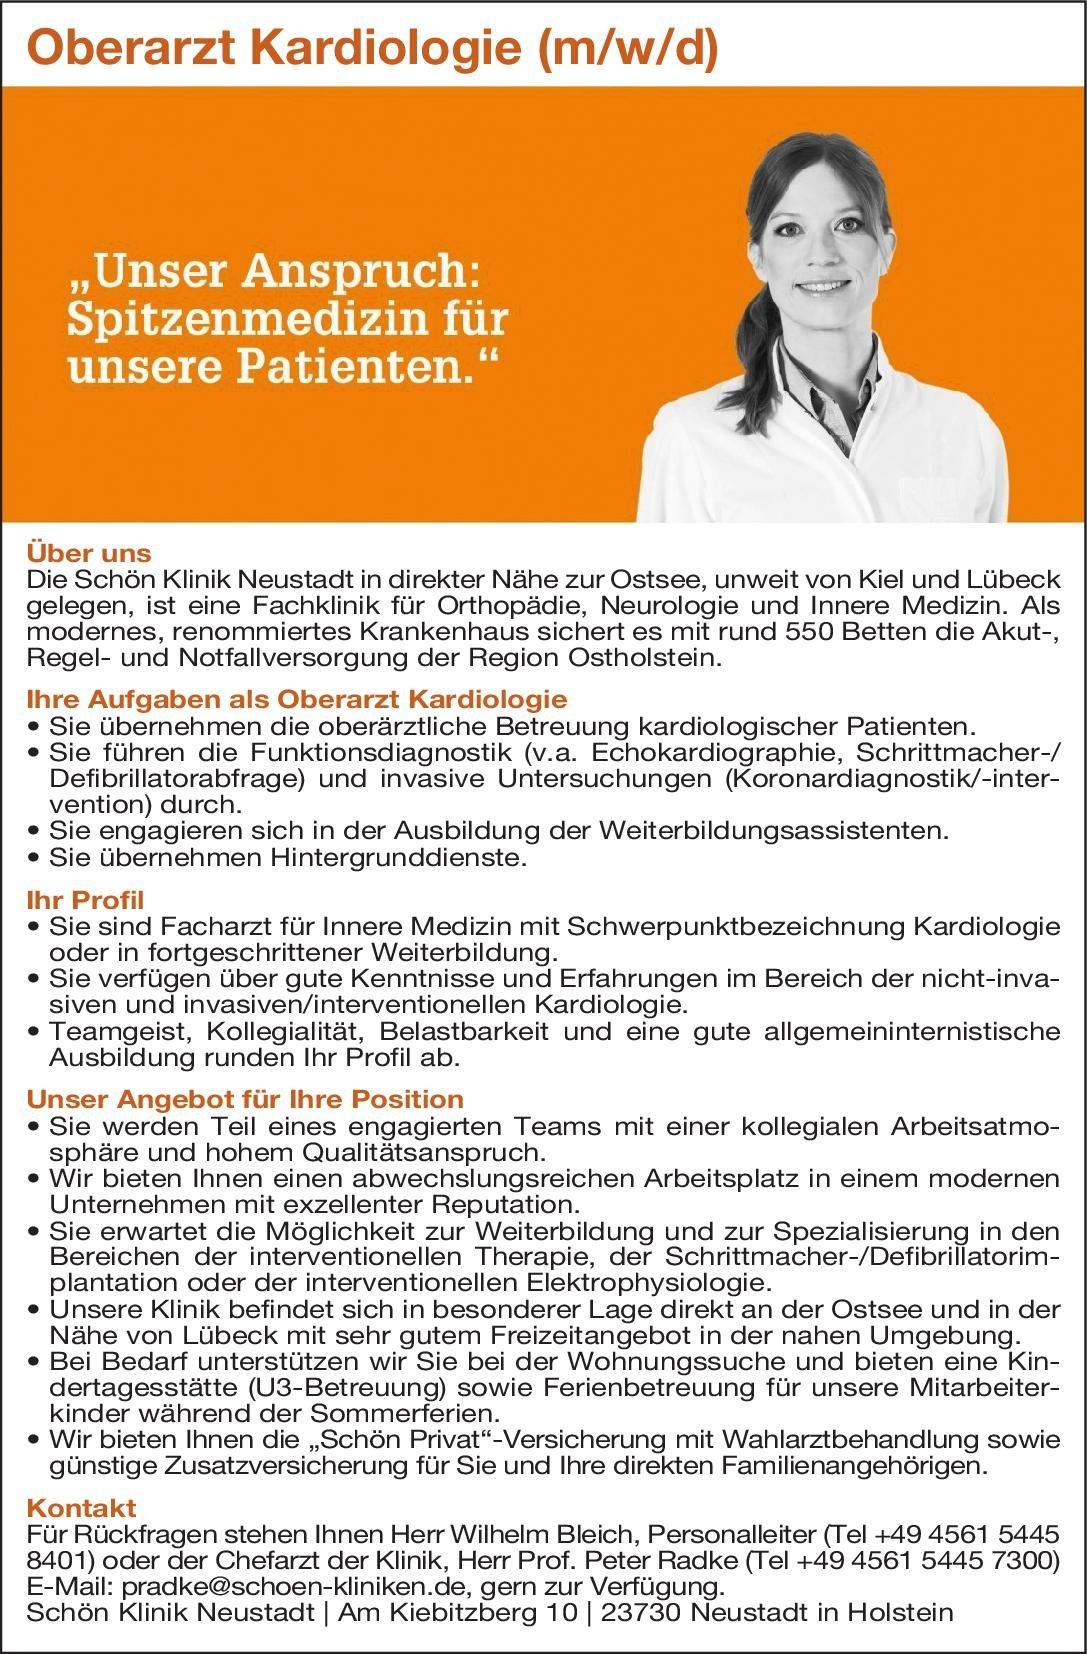 Schön Klinik Neustadt Oberarzt Kardiologie (m/w/d)  Innere Medizin und Kardiologie, Innere Medizin Oberarzt